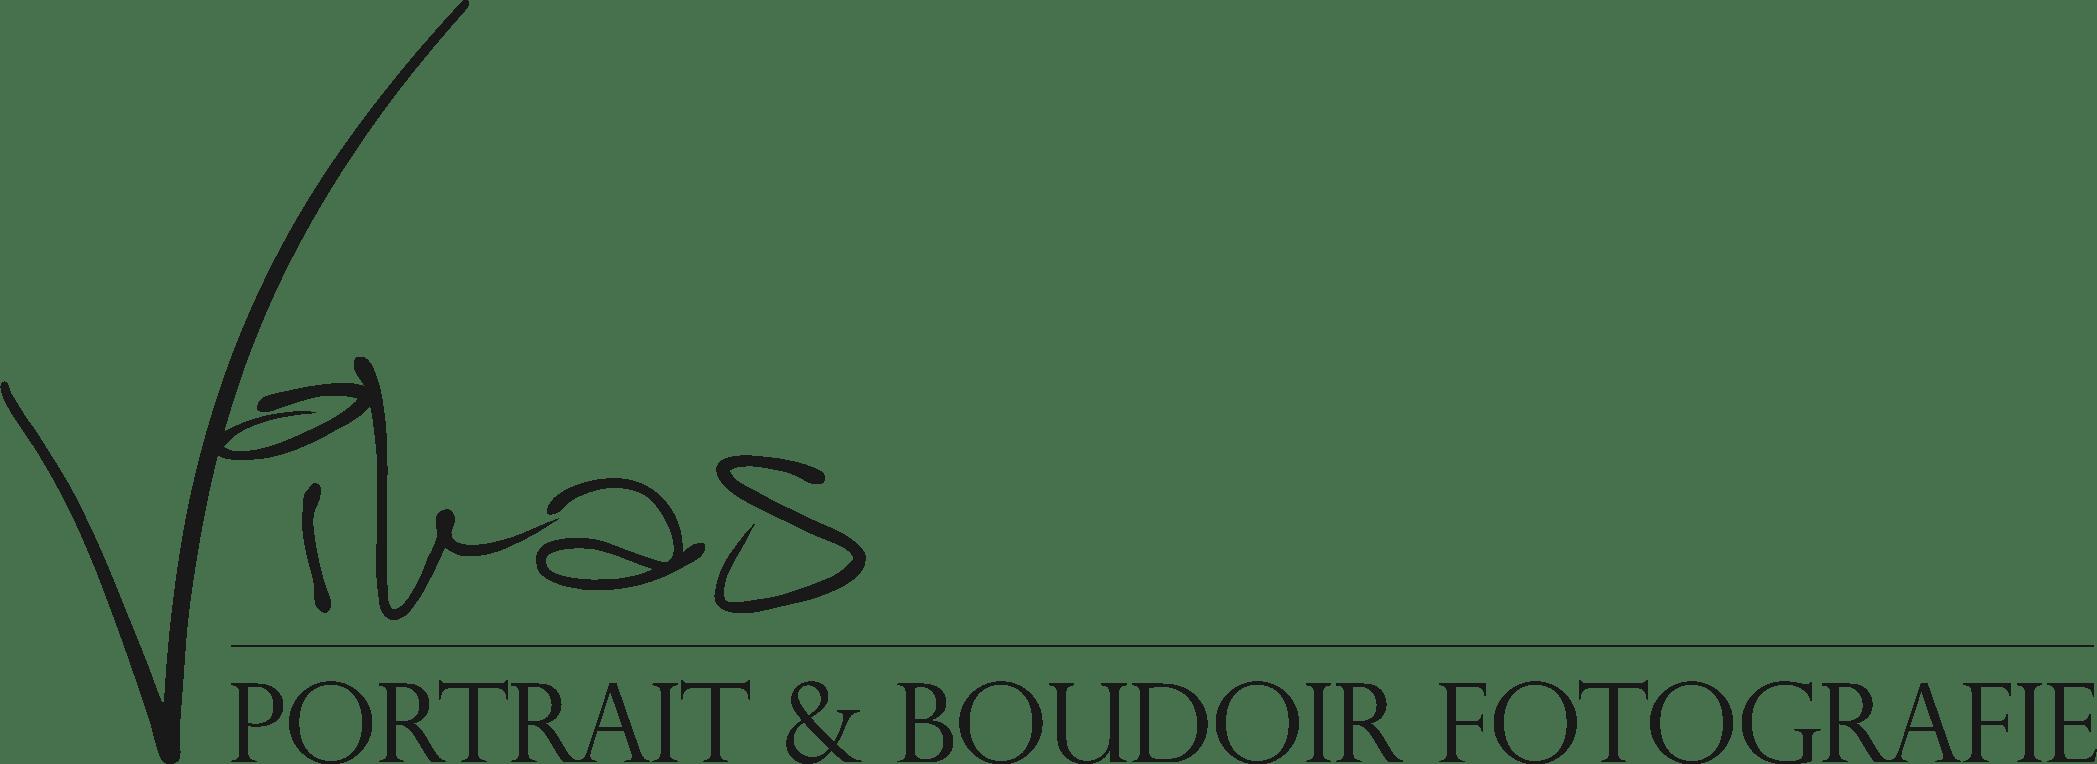 Logo Vikas Portrait und Boudoir Fotografie